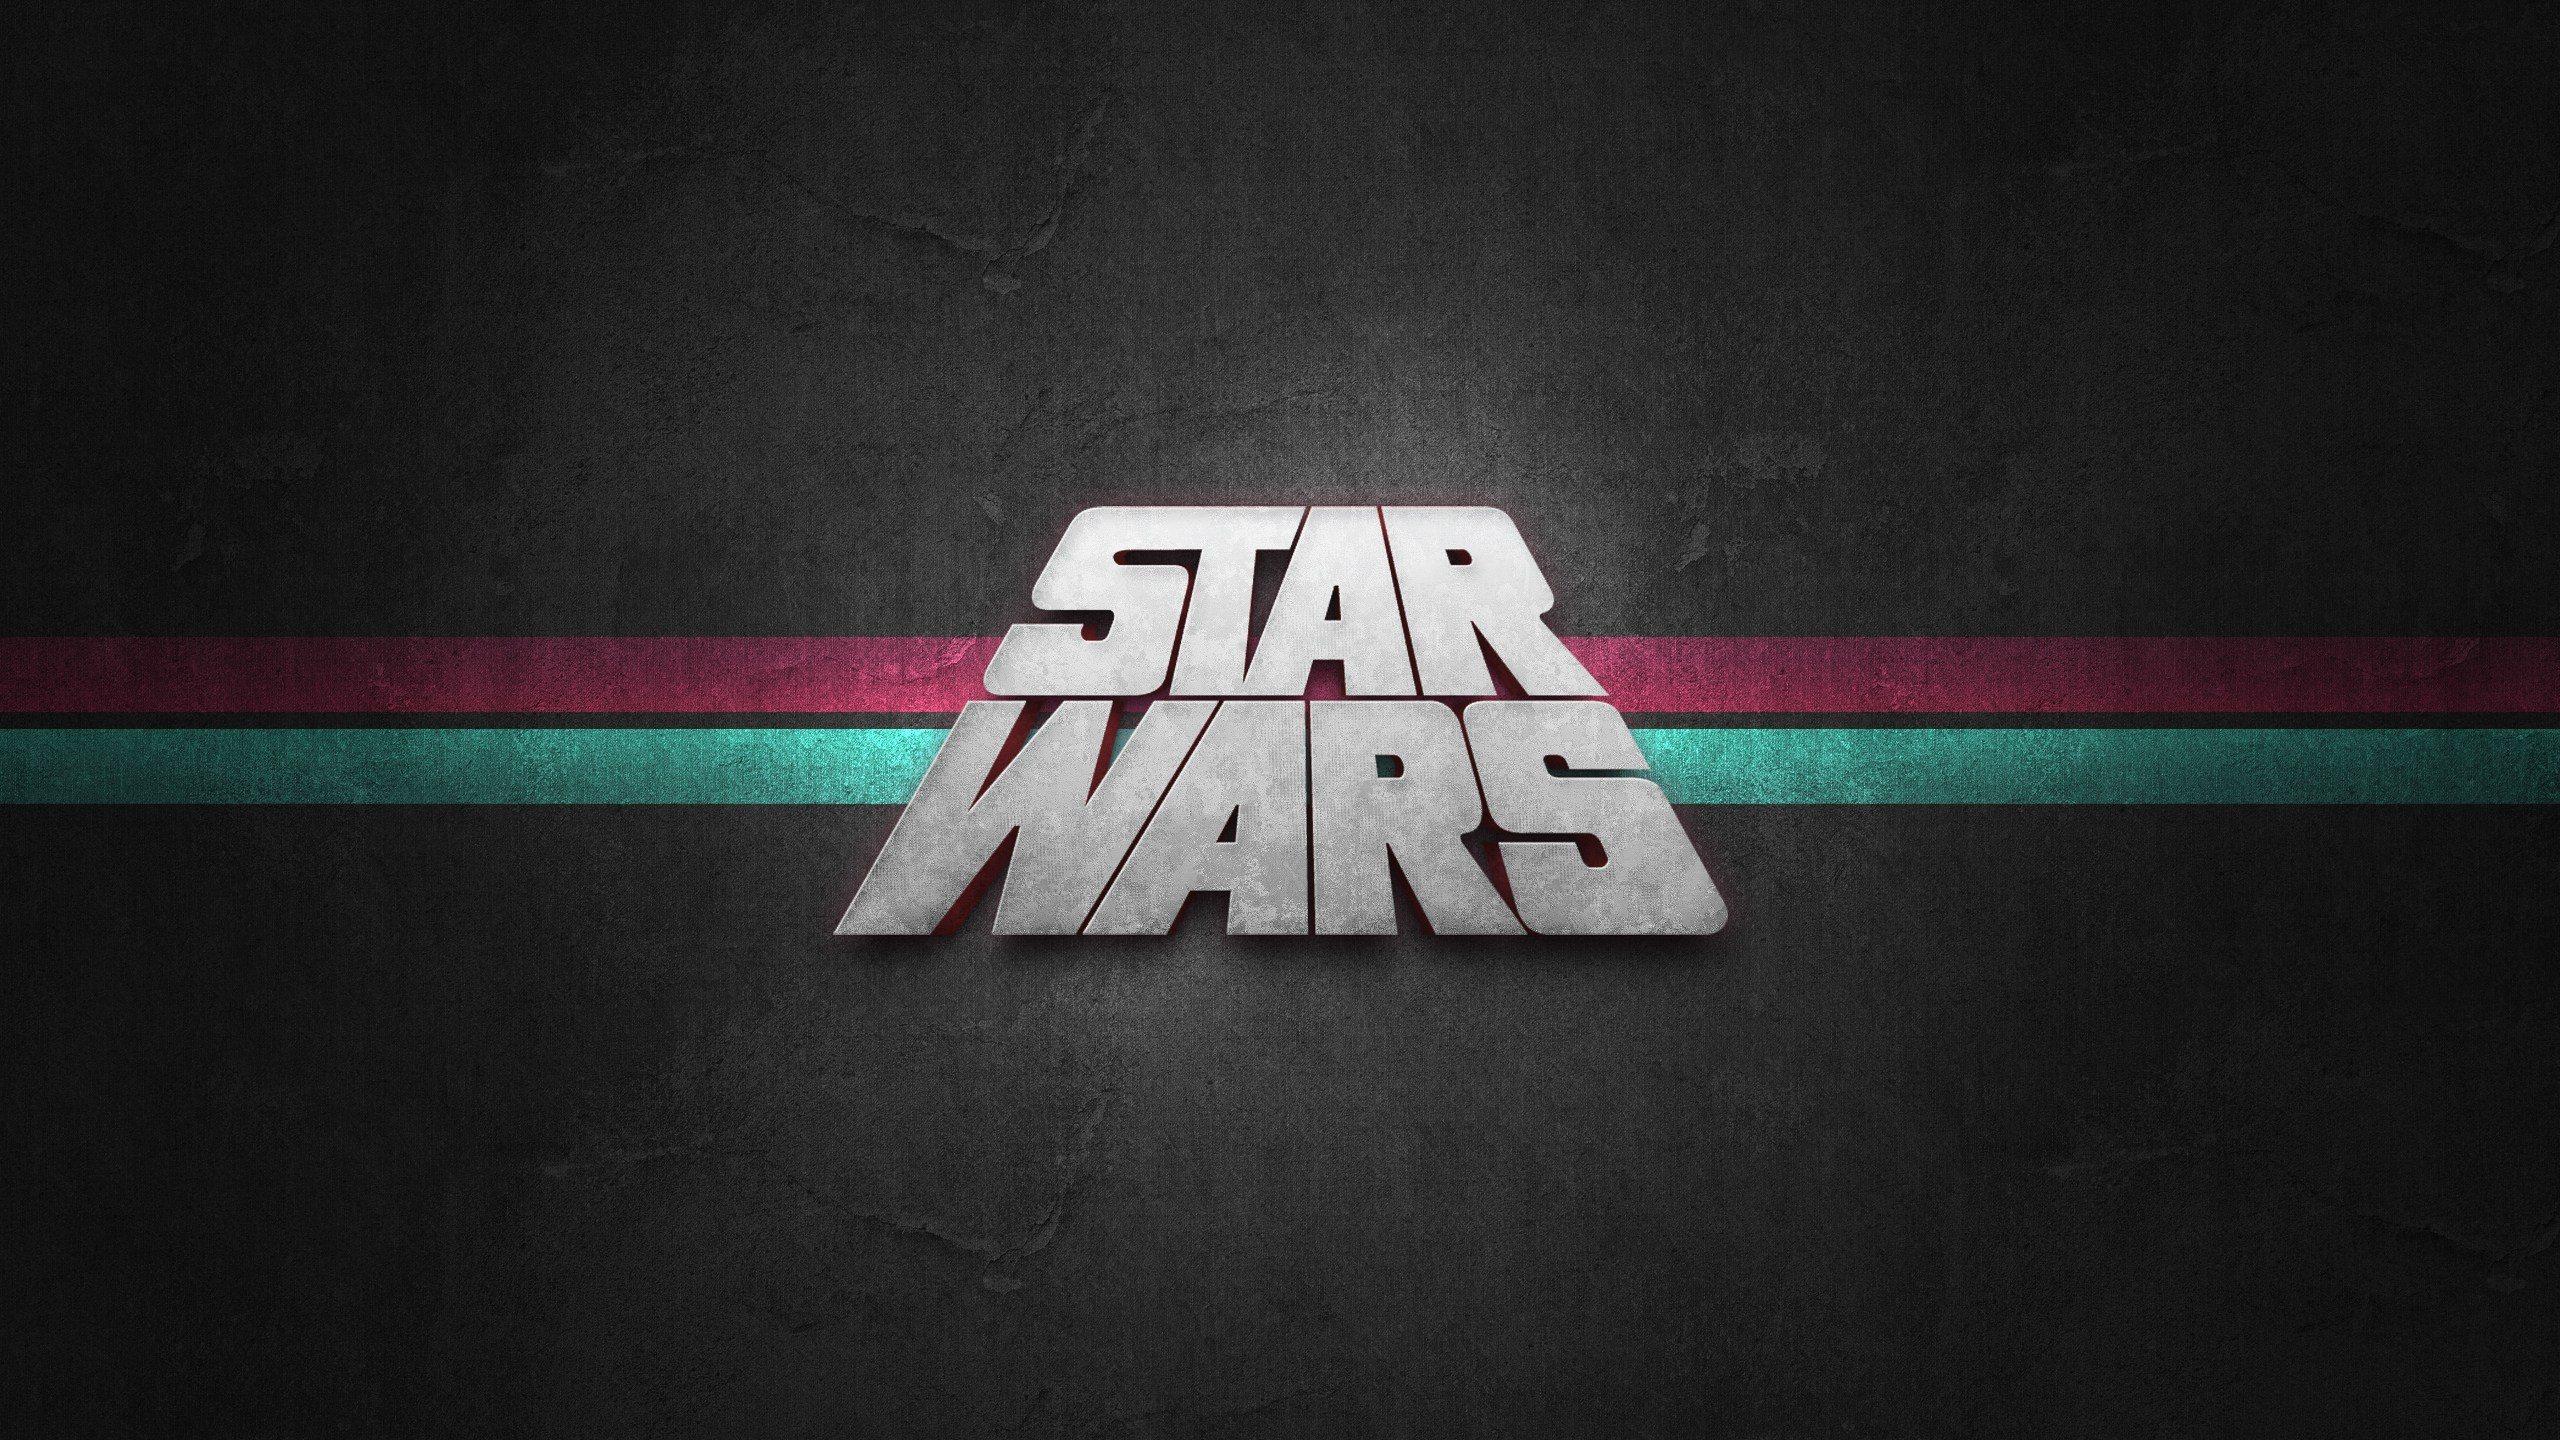 Star Wars Full HD Wallpapers download 1080p desktop backgrounds 2560x1440